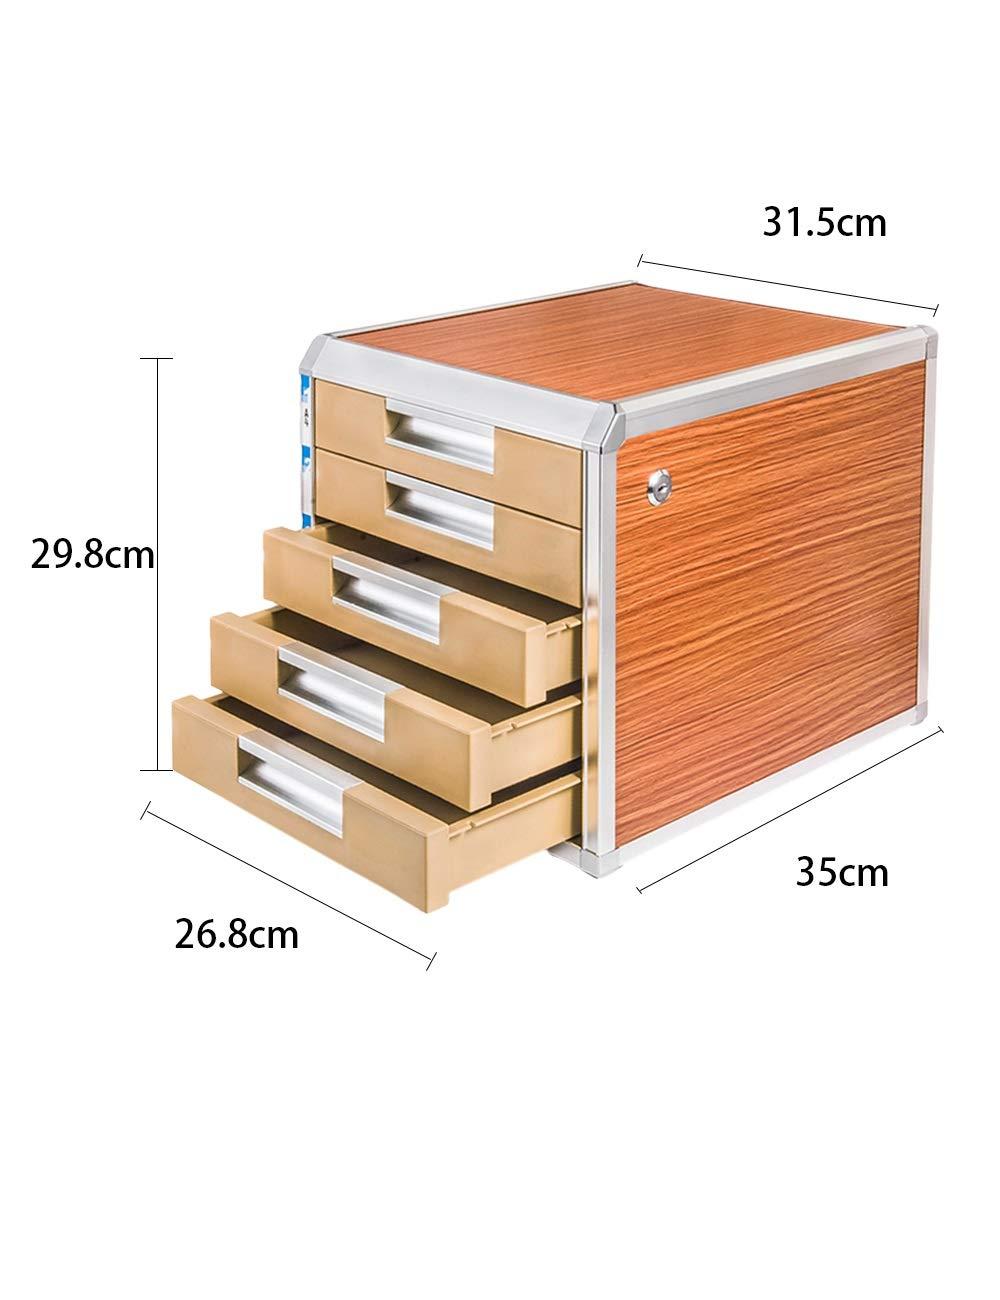 File Cabinet Family Desk Decoration Storage Box 5th Floor Aluminum Alloy + Wood Board + Plastic Desk Organizer Filing cabinets